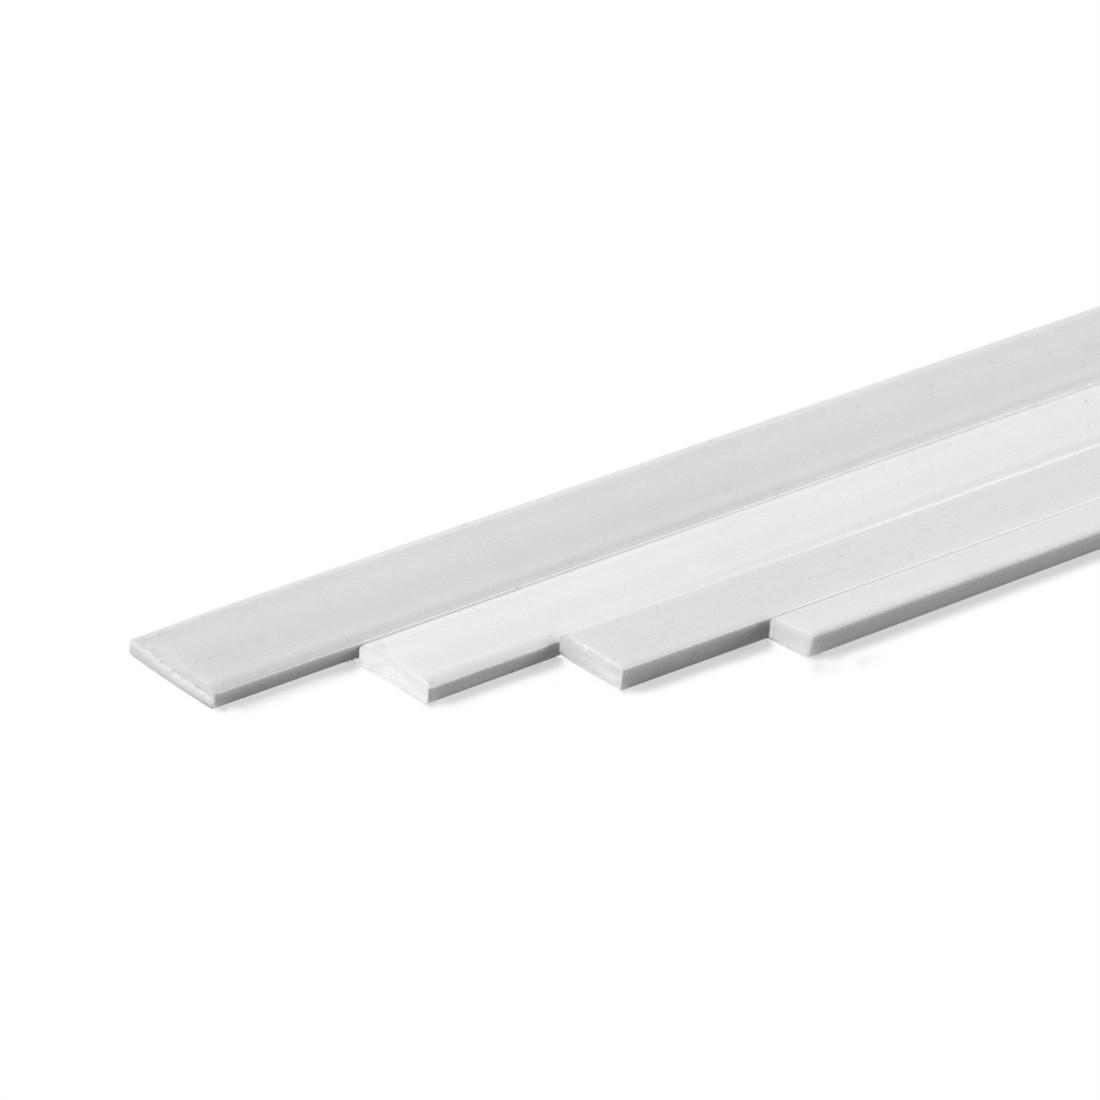 ASA rectangular profile mm.1x3x1000